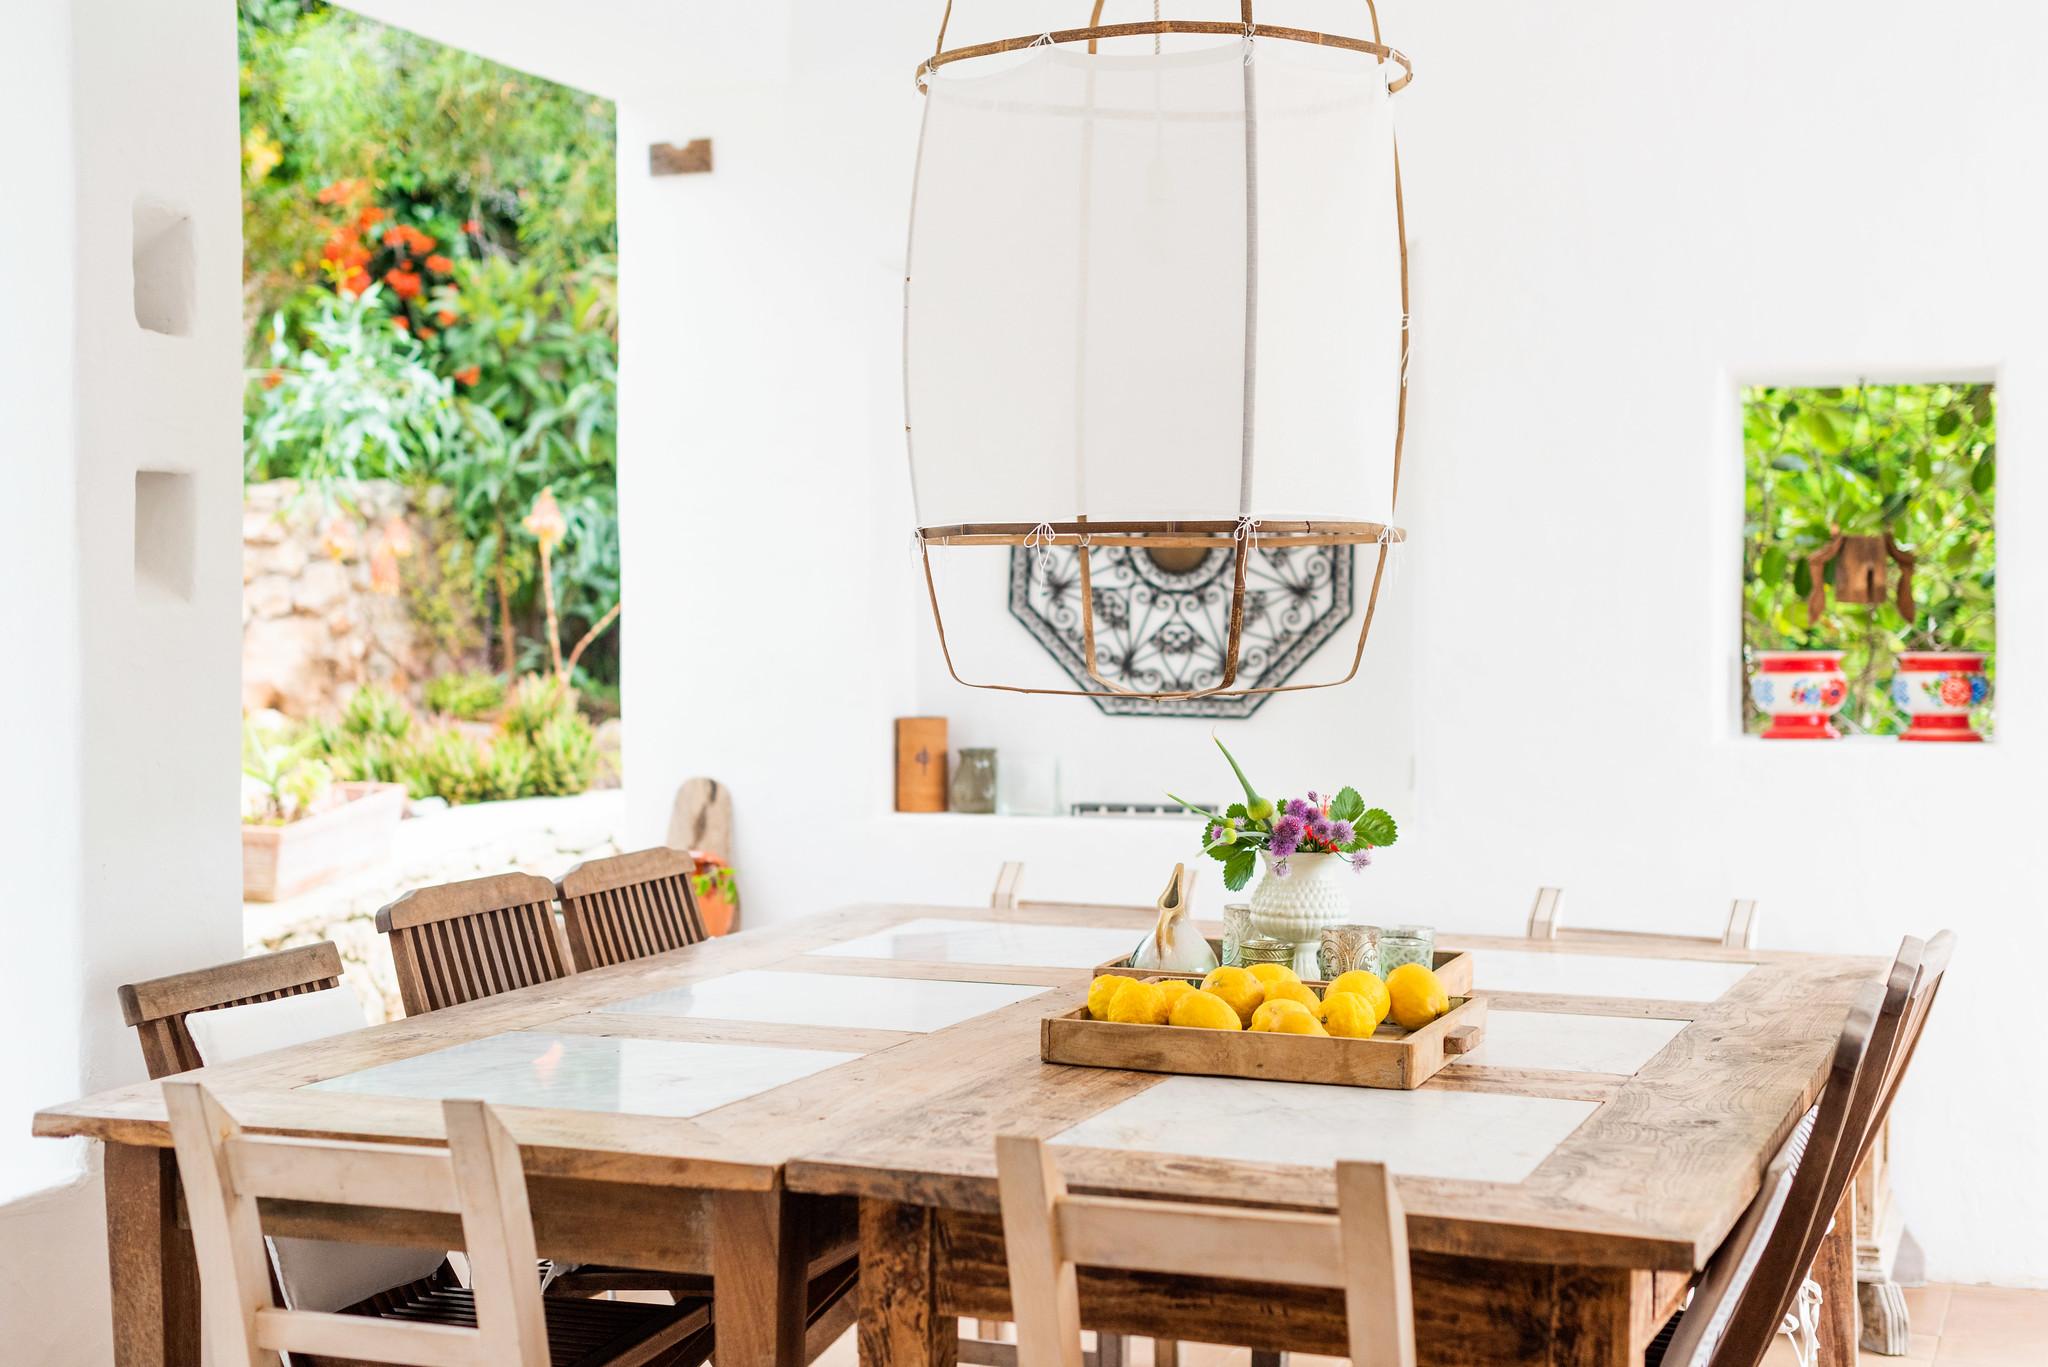 https://www.white-ibiza.com/wp-content/uploads/2020/05/white-ibiza-villas-can-lyra-dining.jpg